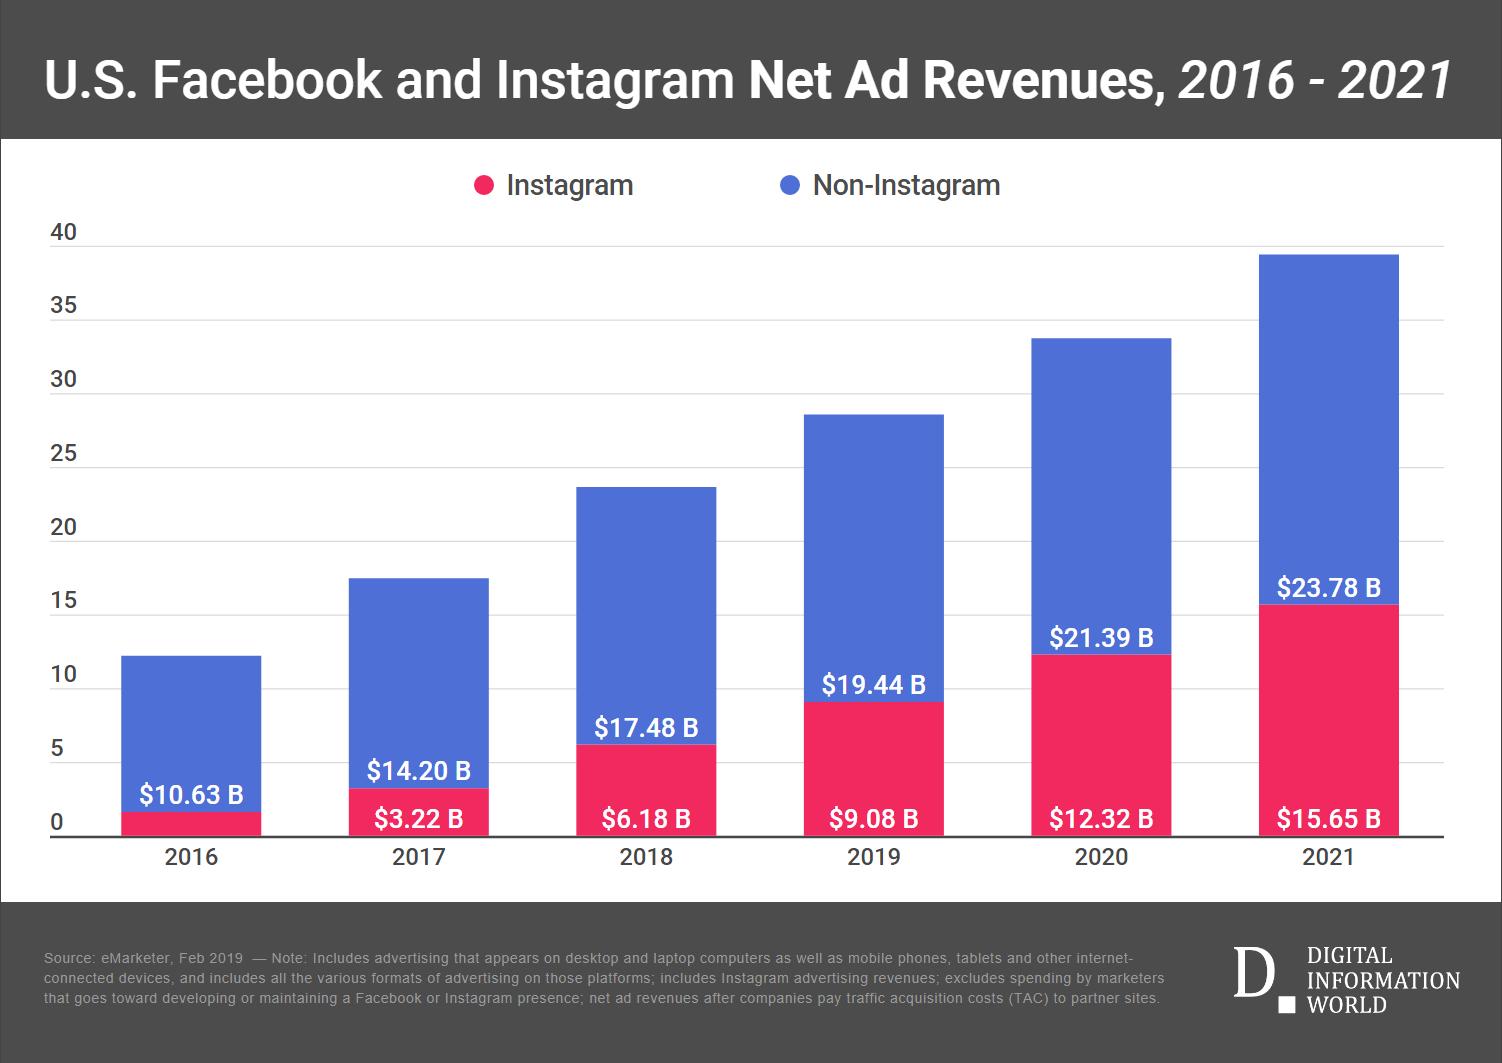 US Facebook and Instagram Net Ad Revenues, 2016-2021 (billions)